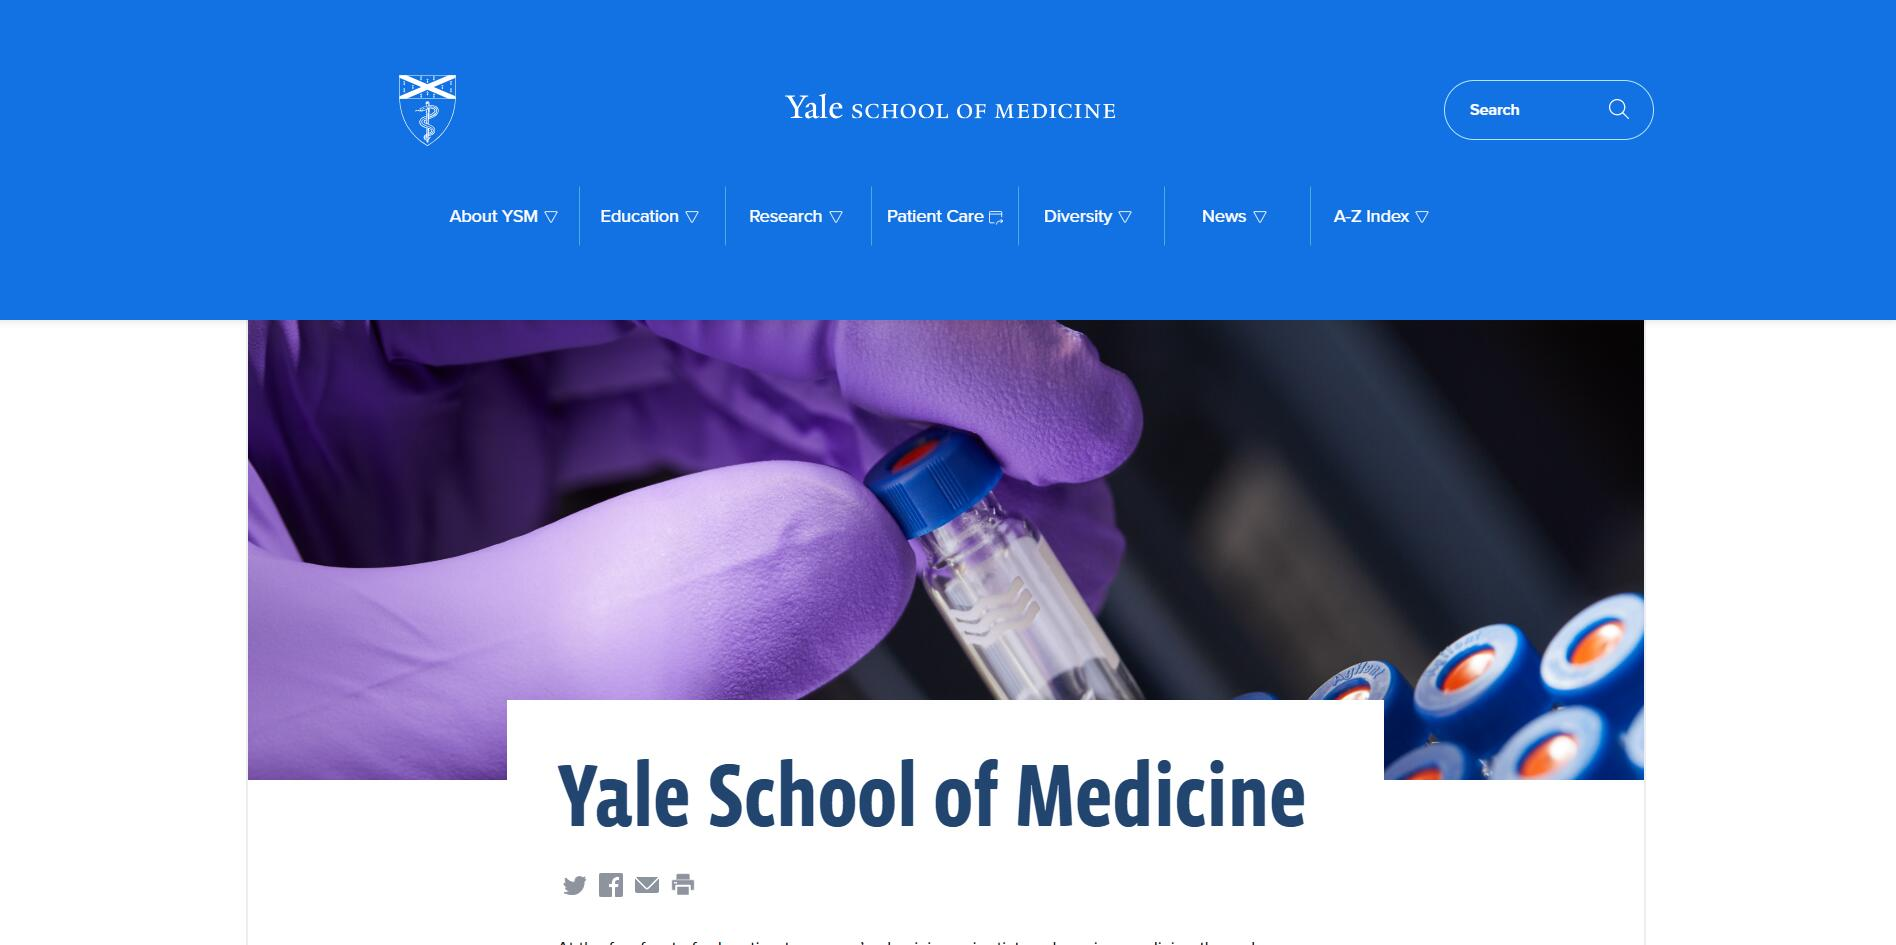 The School of Medicine at Yale University